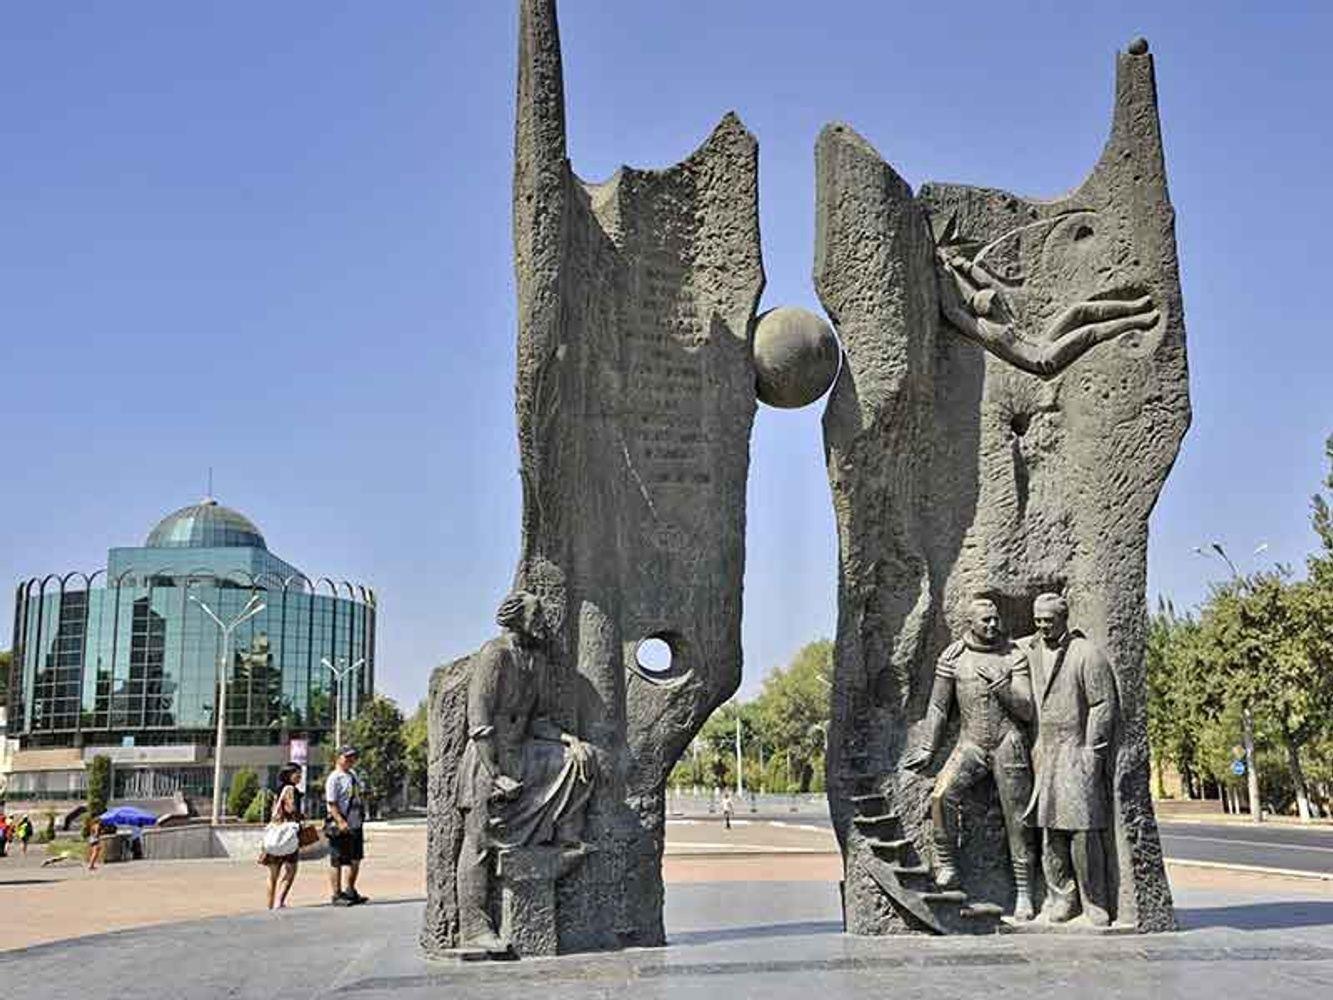 Worderfull Tashkent Trip - 4 Nights, 5 Days